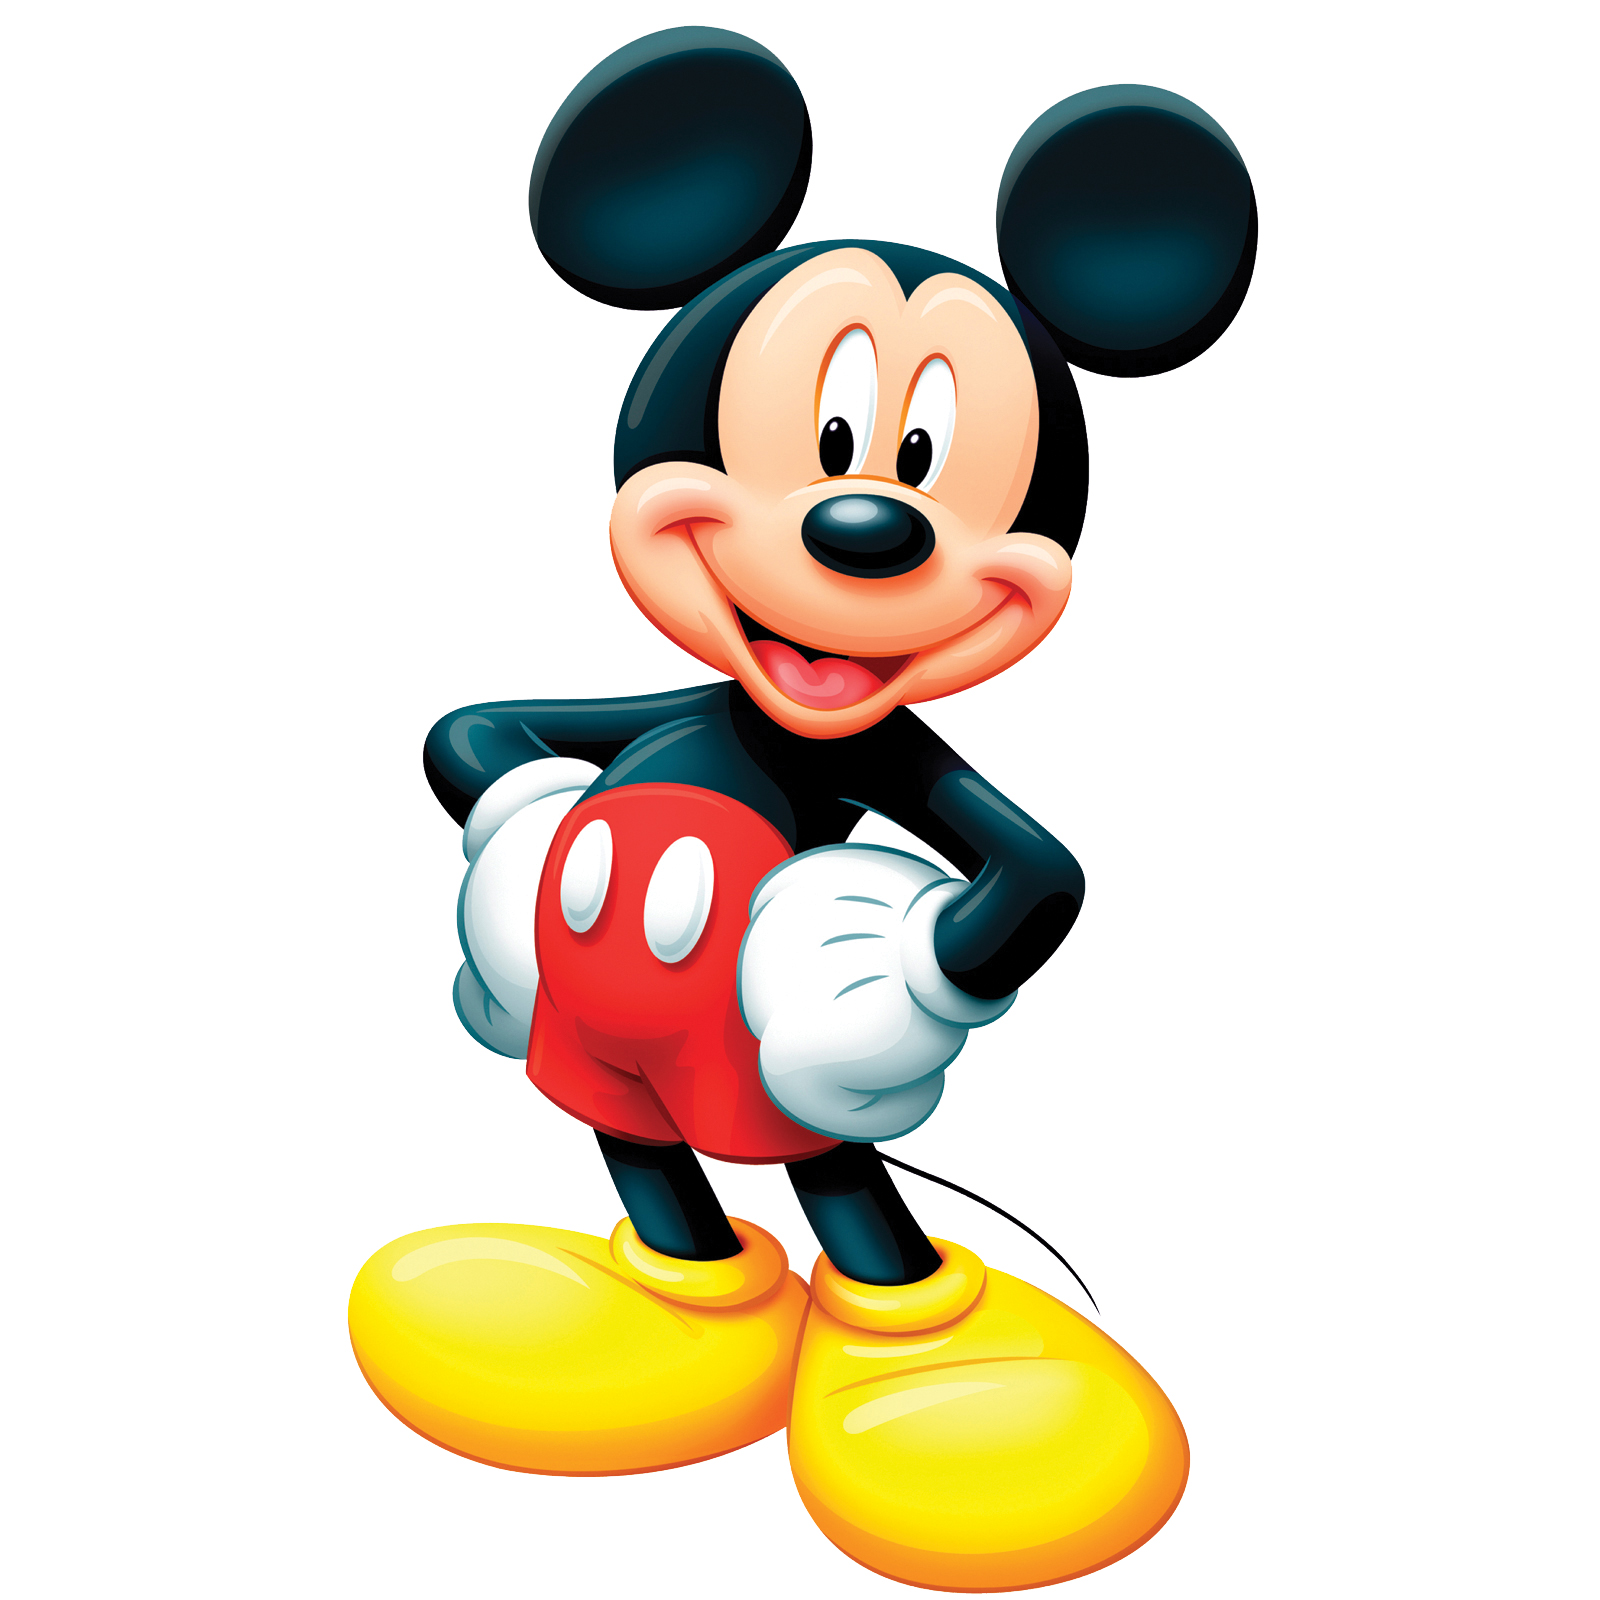 Kartun mickey mouse macam mana rupa mickey mouse ye haa macam gambar